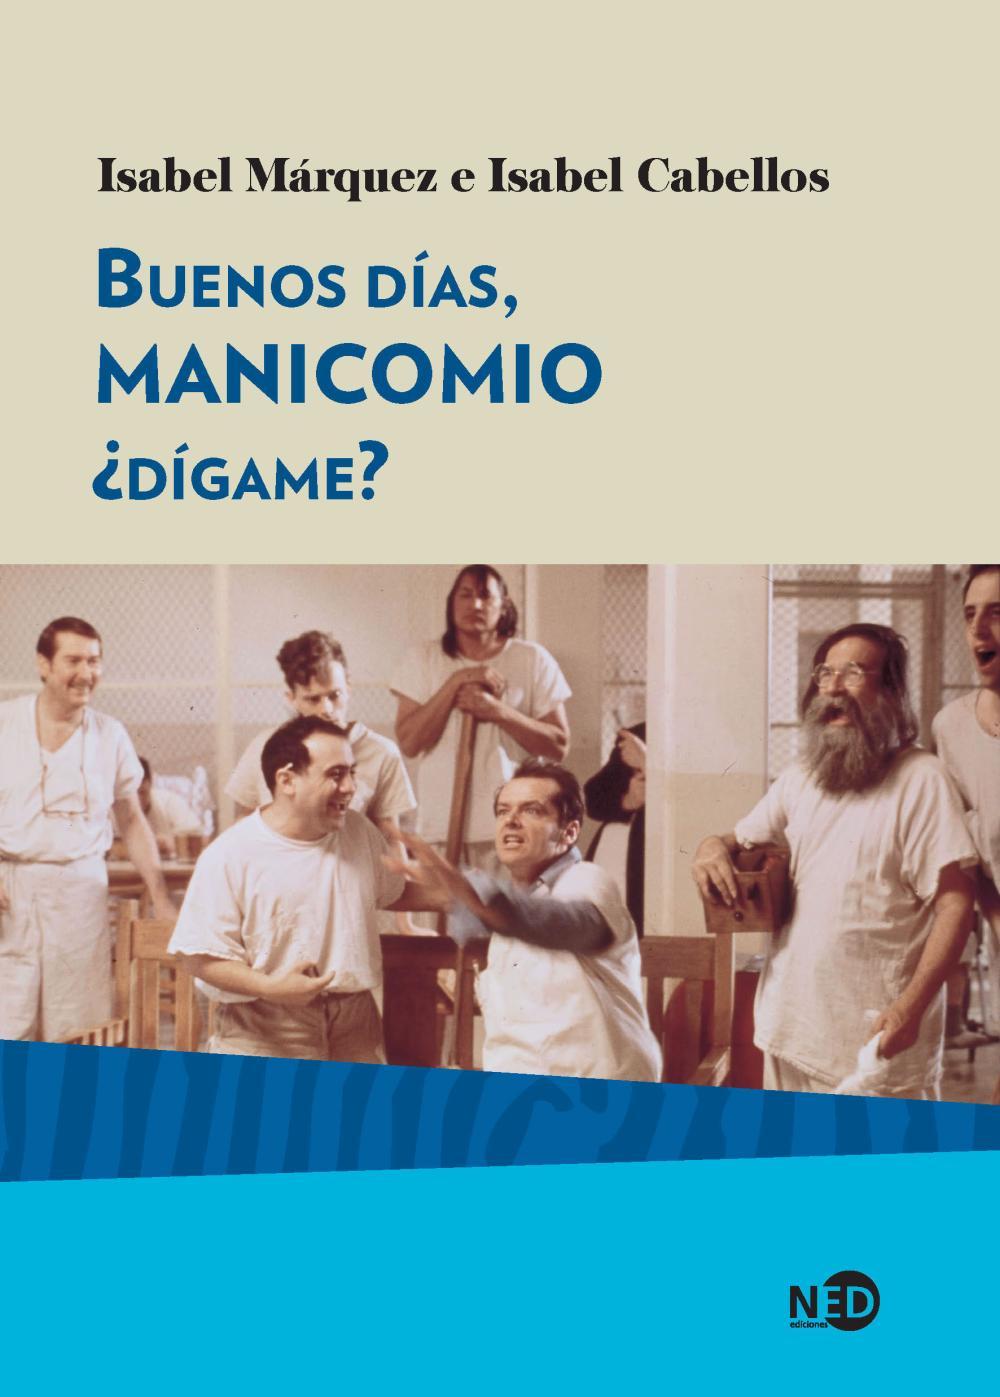 BUENOS DIAS MANICOMIO, ¿DIGAME?